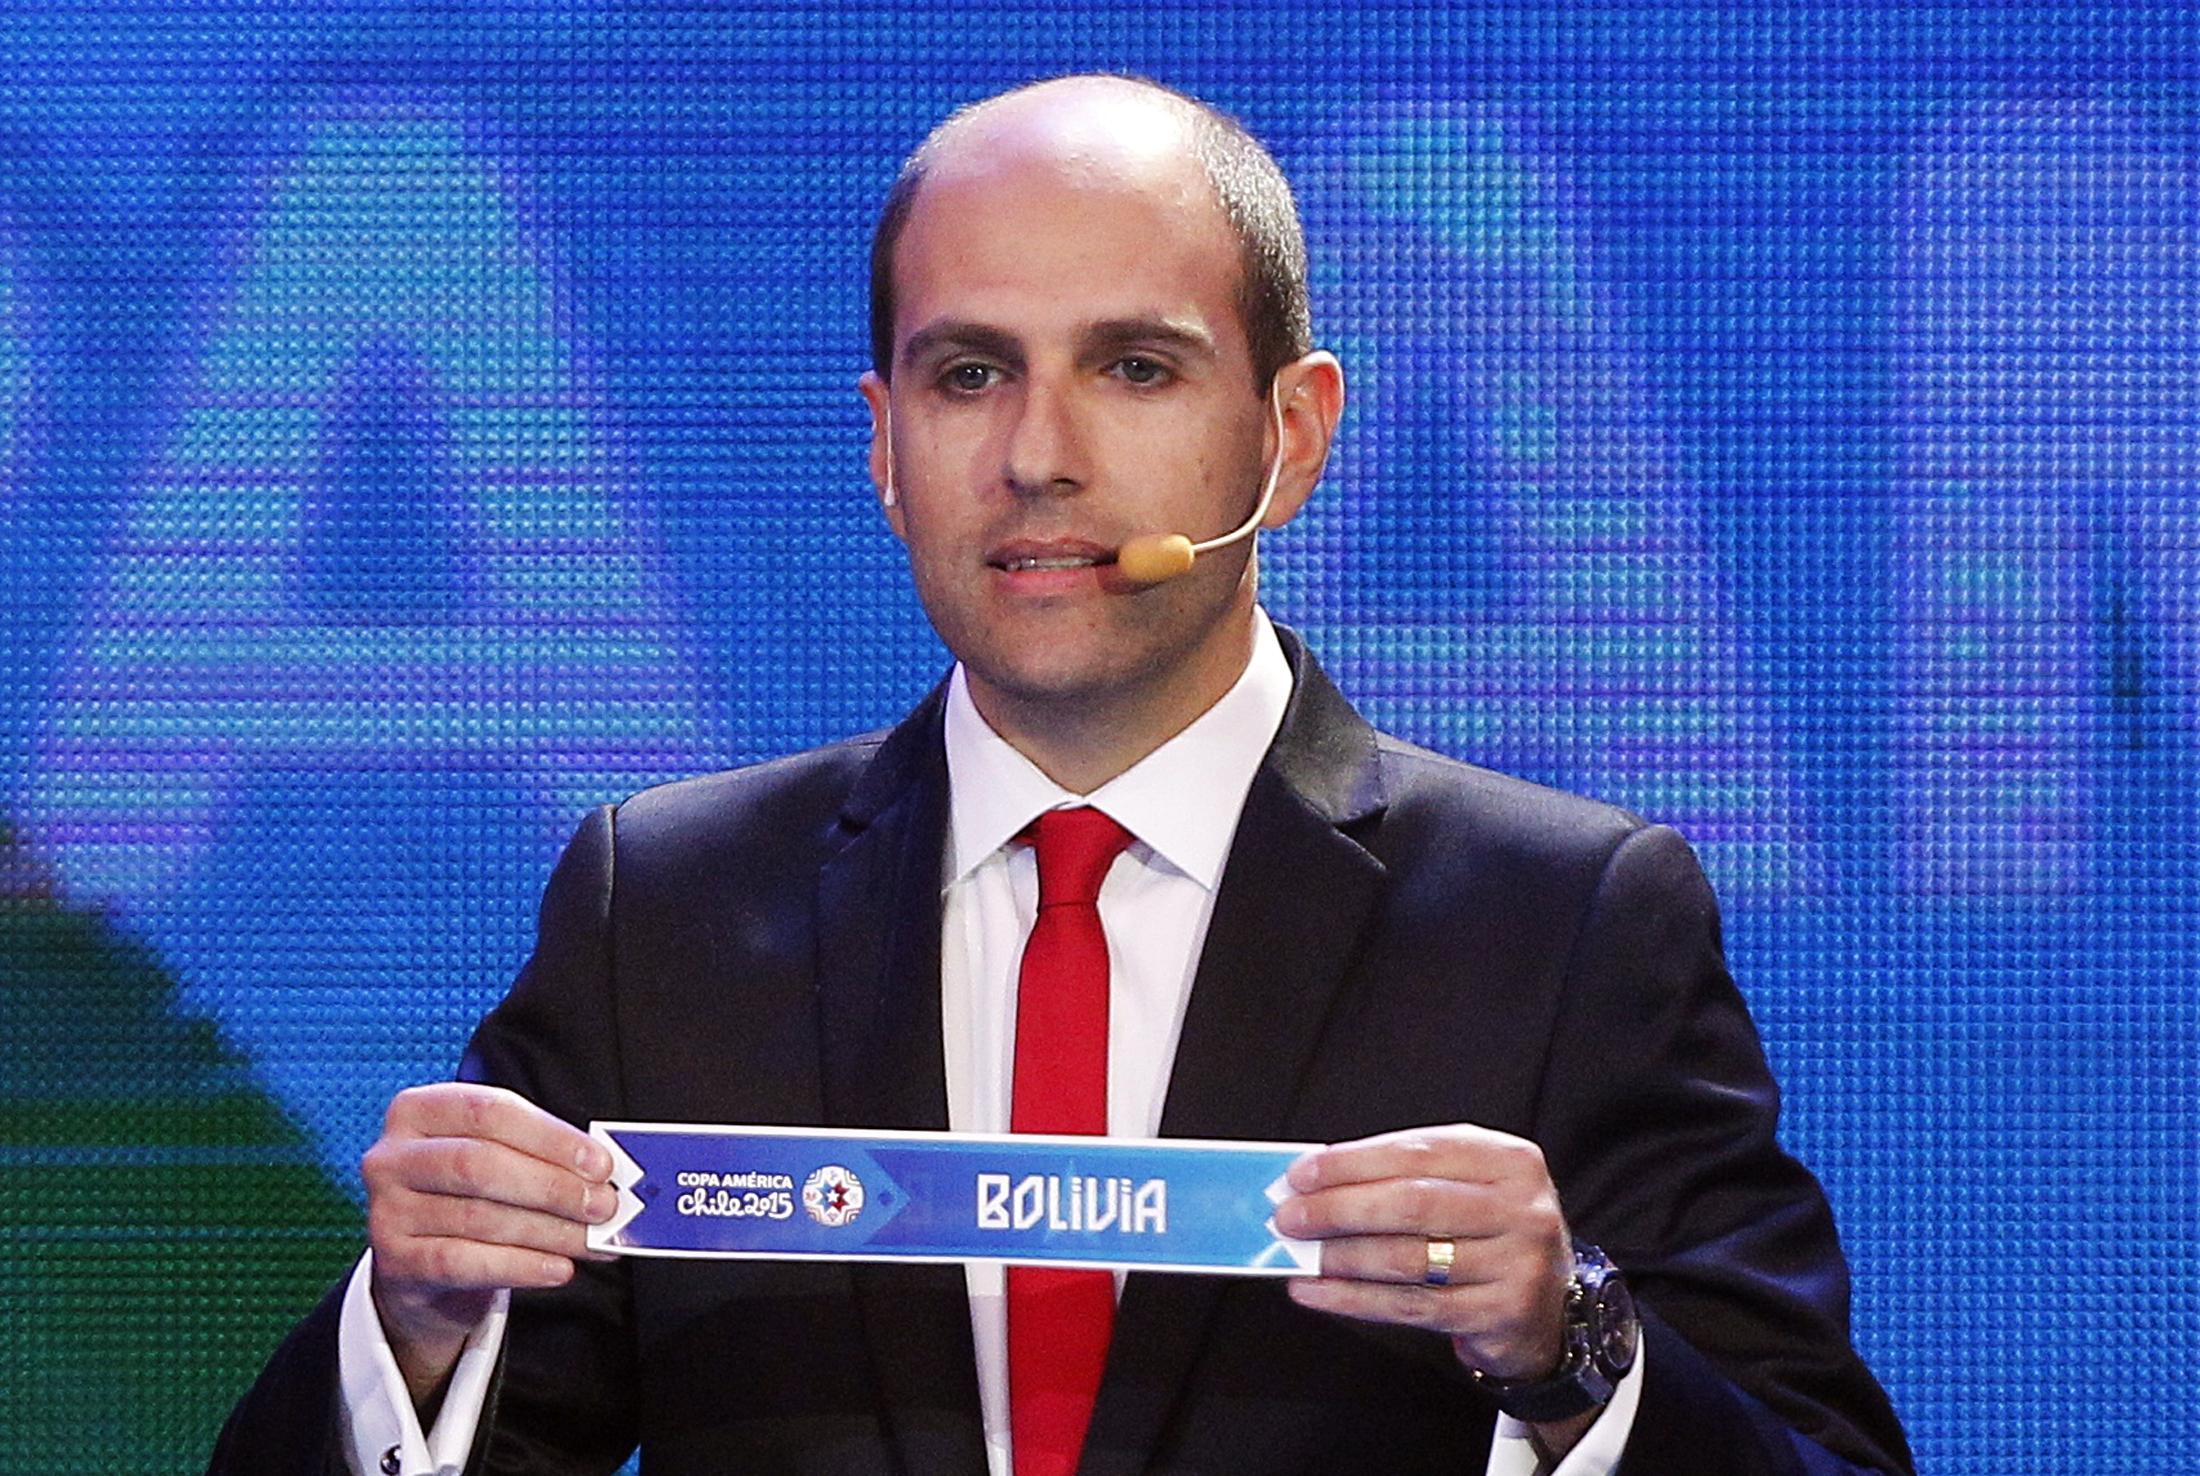 Sergio Jadue Amazon Prime Video El Presidente FIFA Gate serie junio 2020